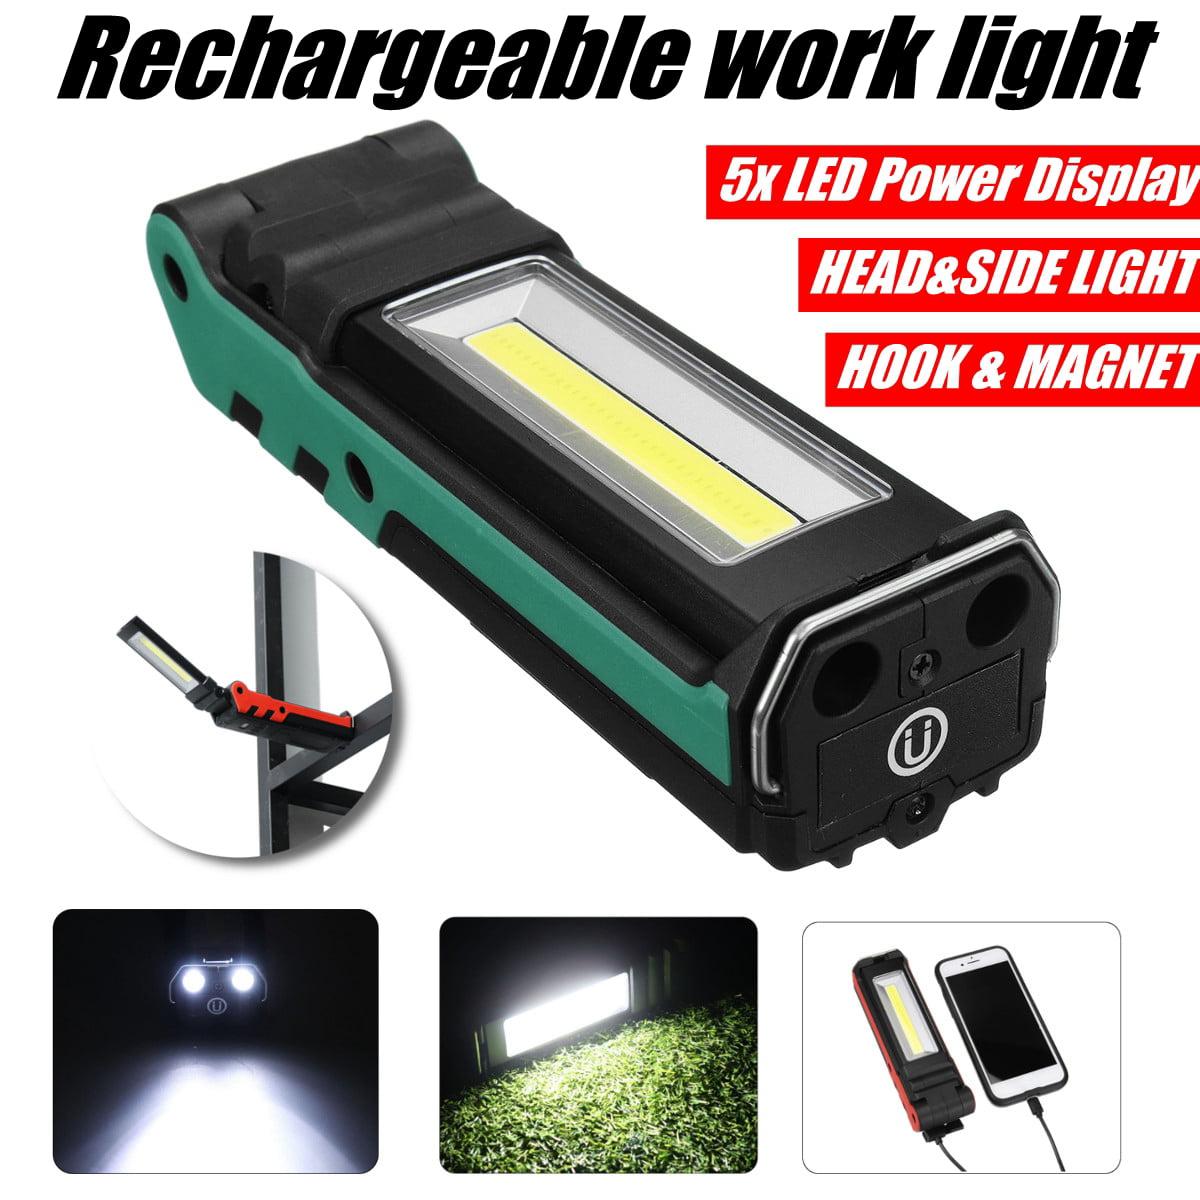 90000LM Rechargeable COB LED Slim Work Light Lamp Flashlight Magnet Torch